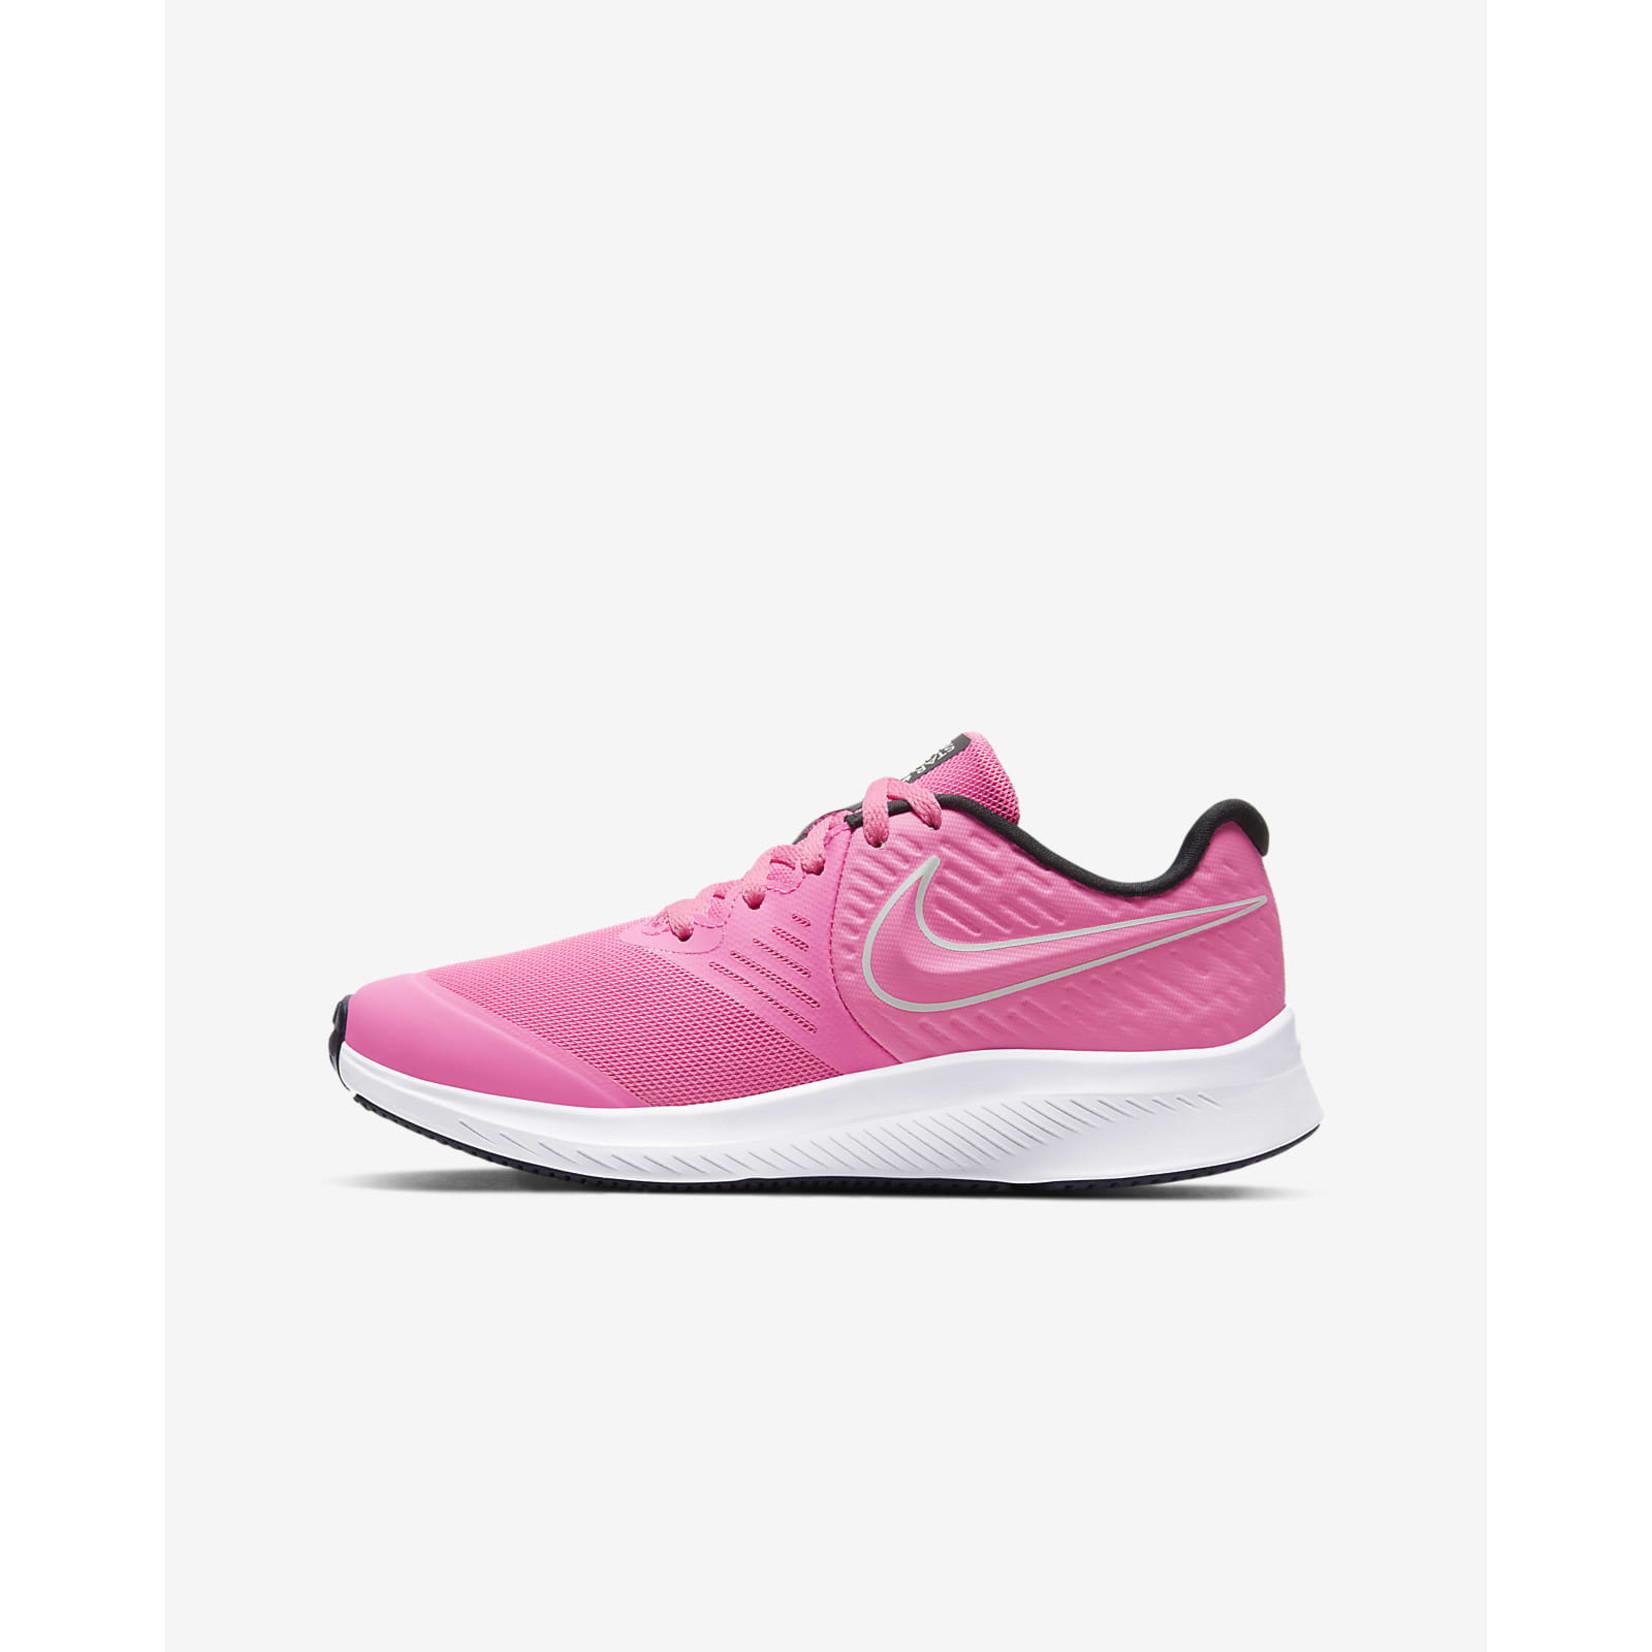 Nike Nike Running Shoes, Star Runner 2, GGS, Girls